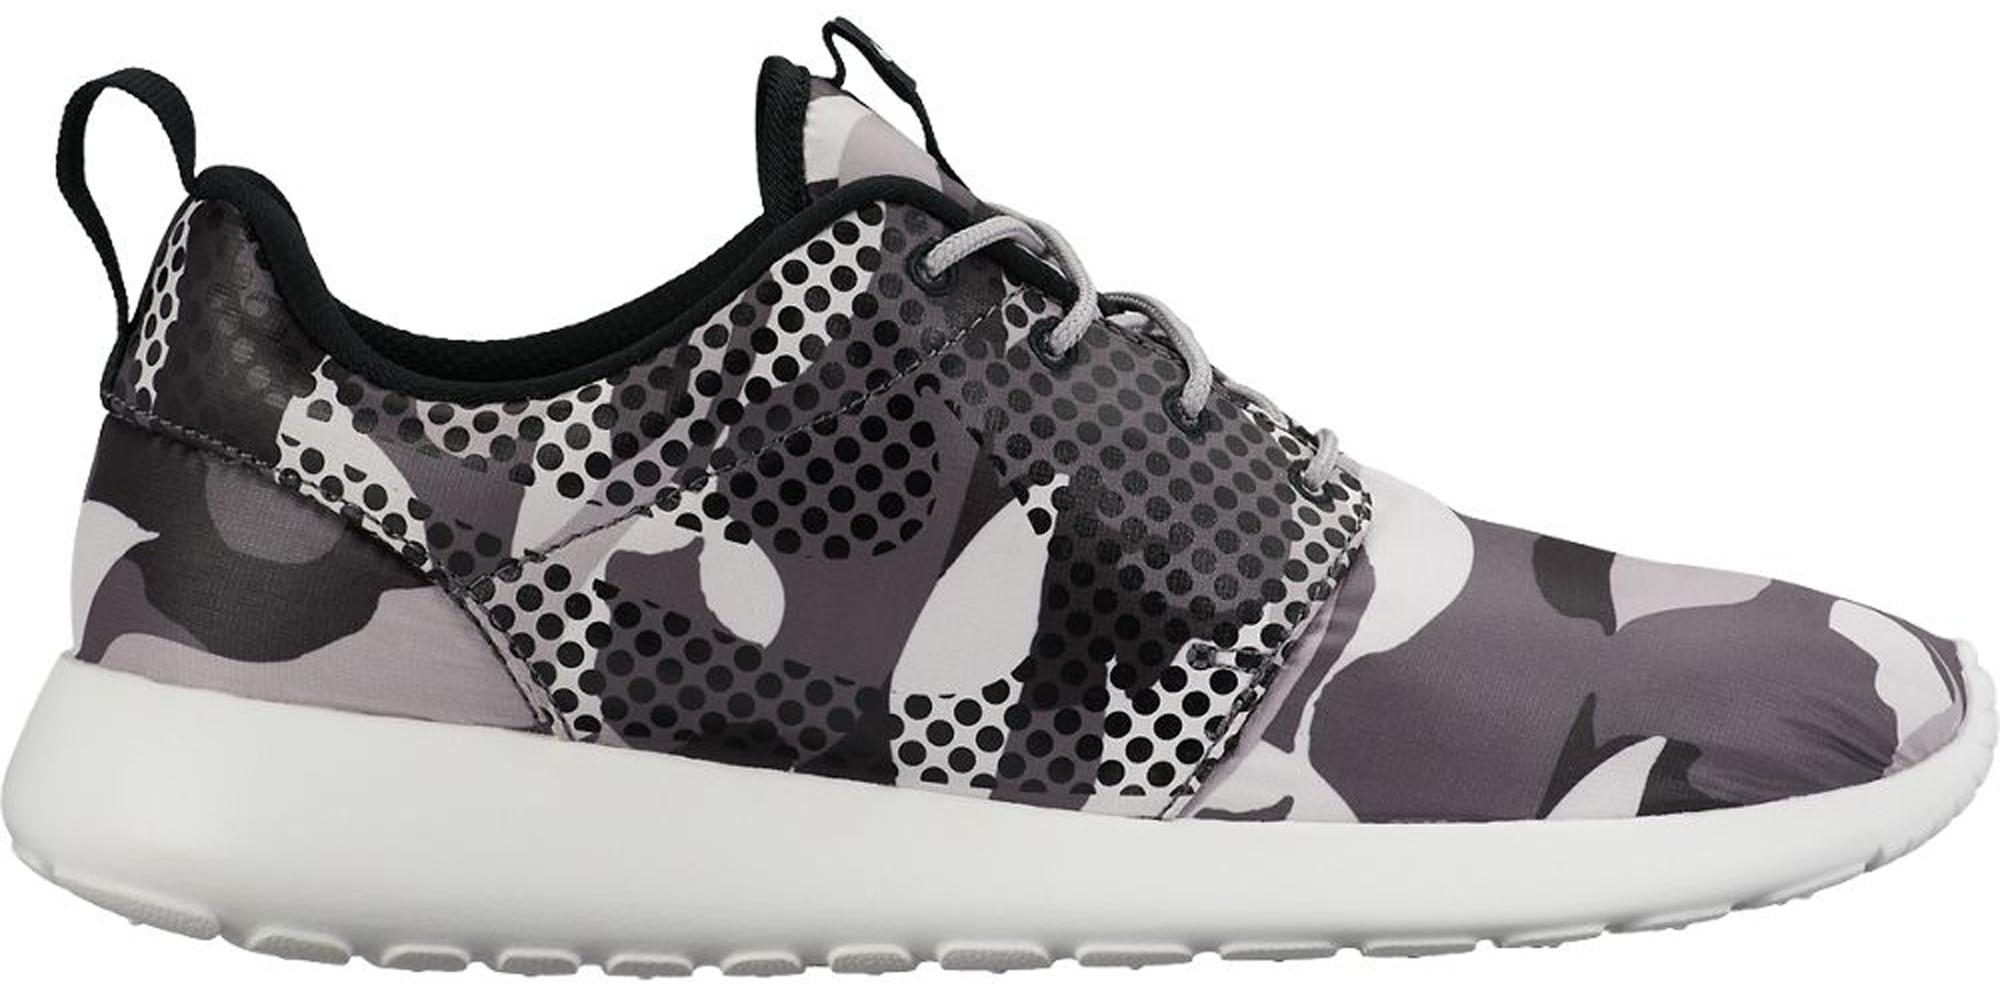 Nike Roshe One Print Camo White Black